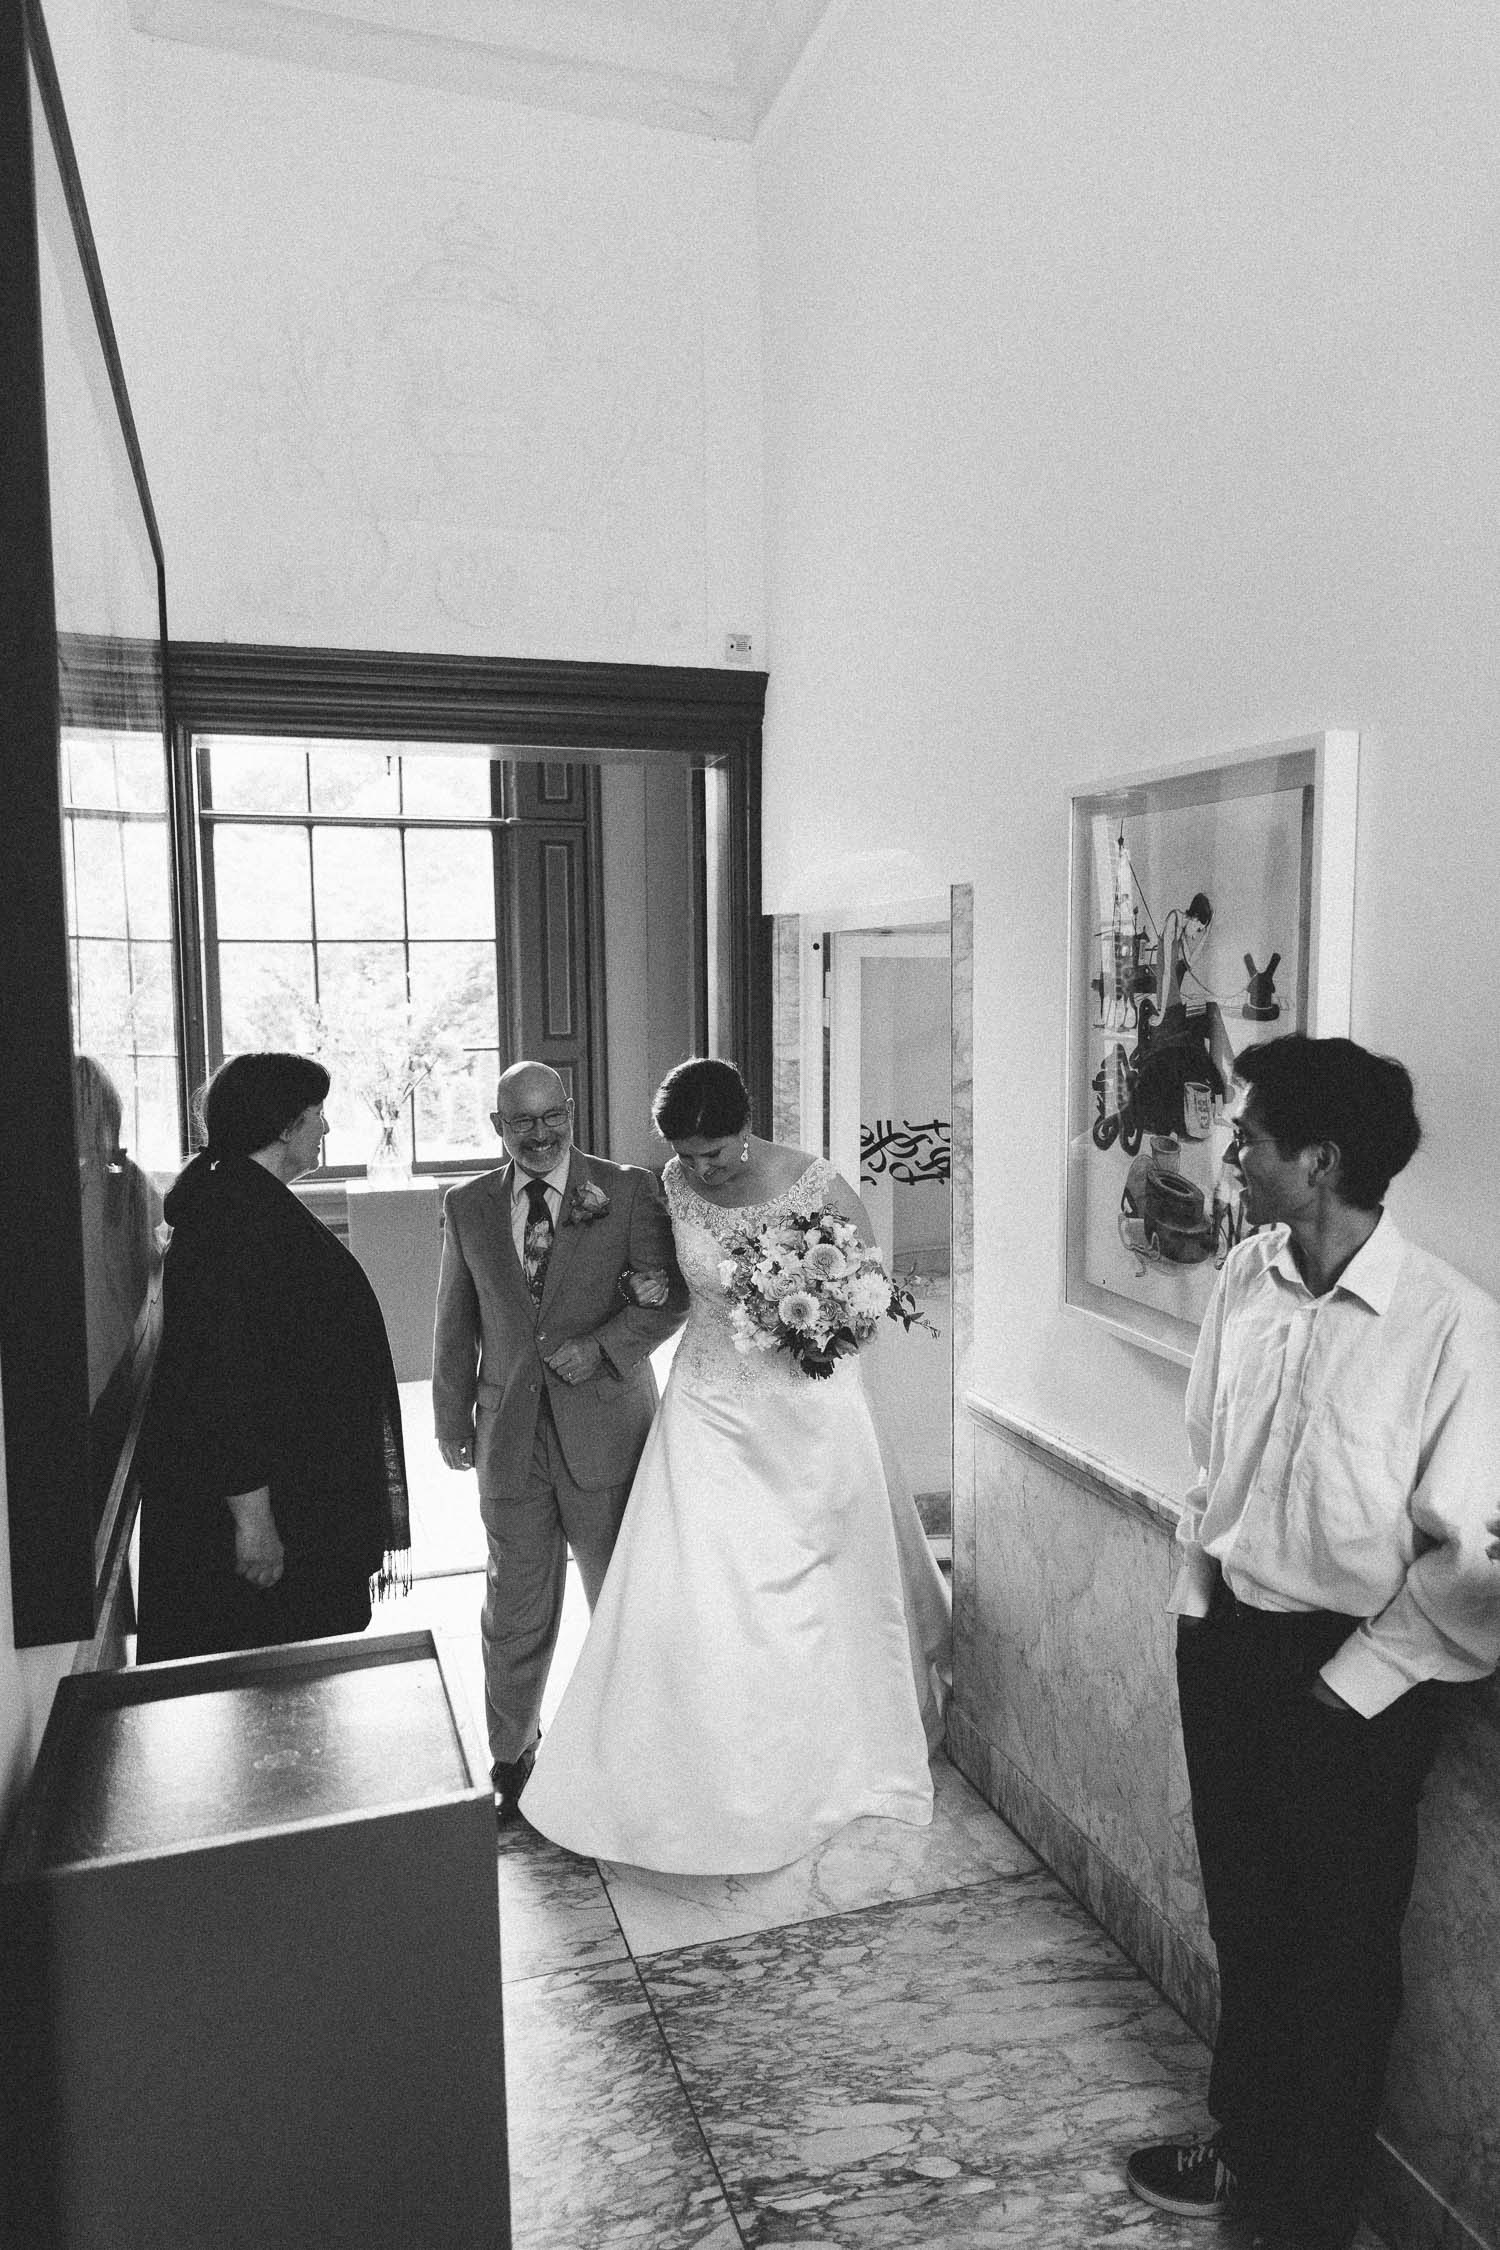 Wedding-huwelijk-trouwen-bruiloft-photography-fotografie-fotograaf-photographer-Huize-Frankendael-On-a-hazy-morning-Amsterdam-The-Netherlands-25.jpg